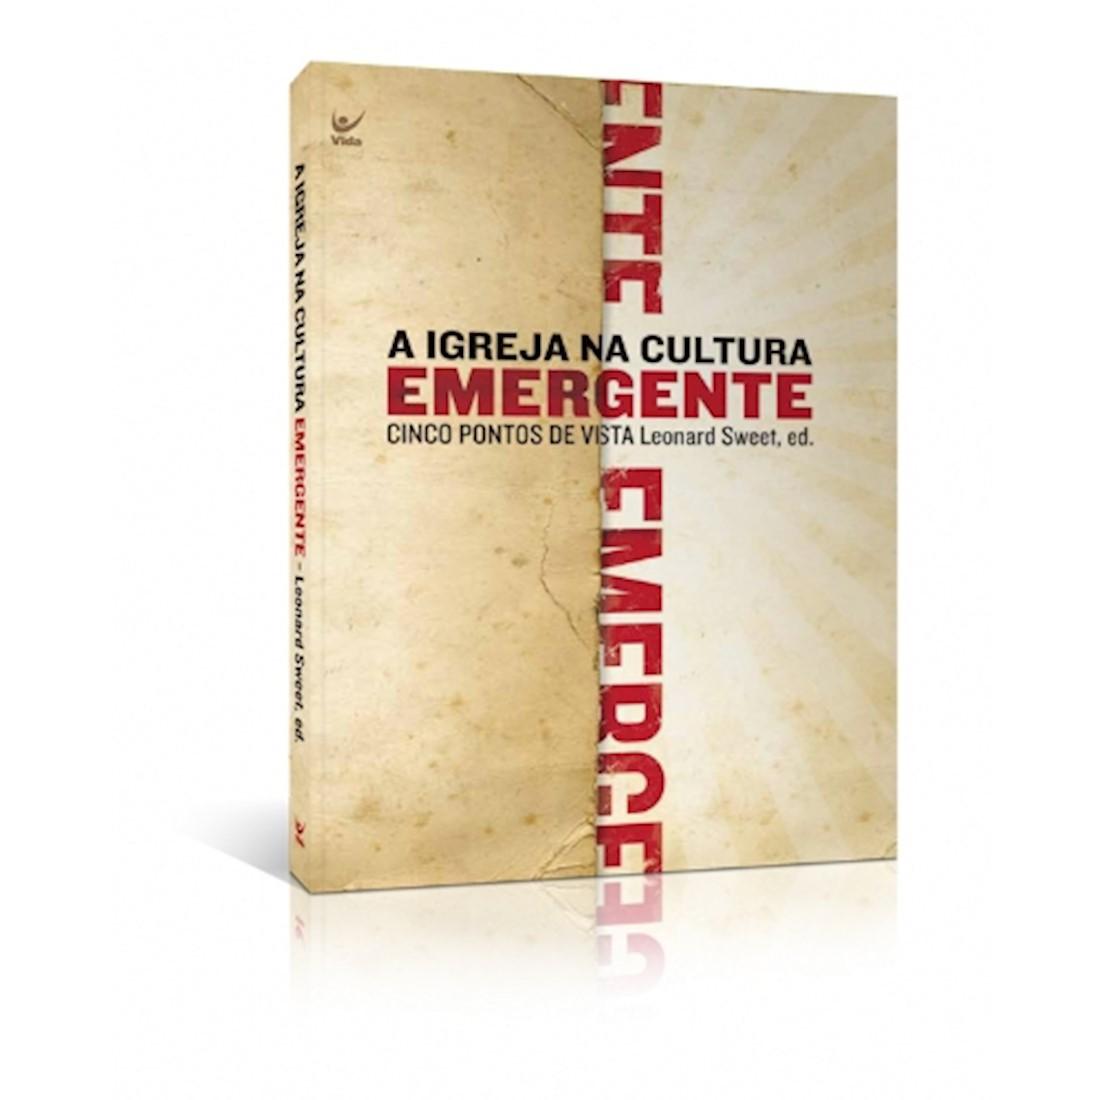 Livro A Igreja na Cultura Emergente